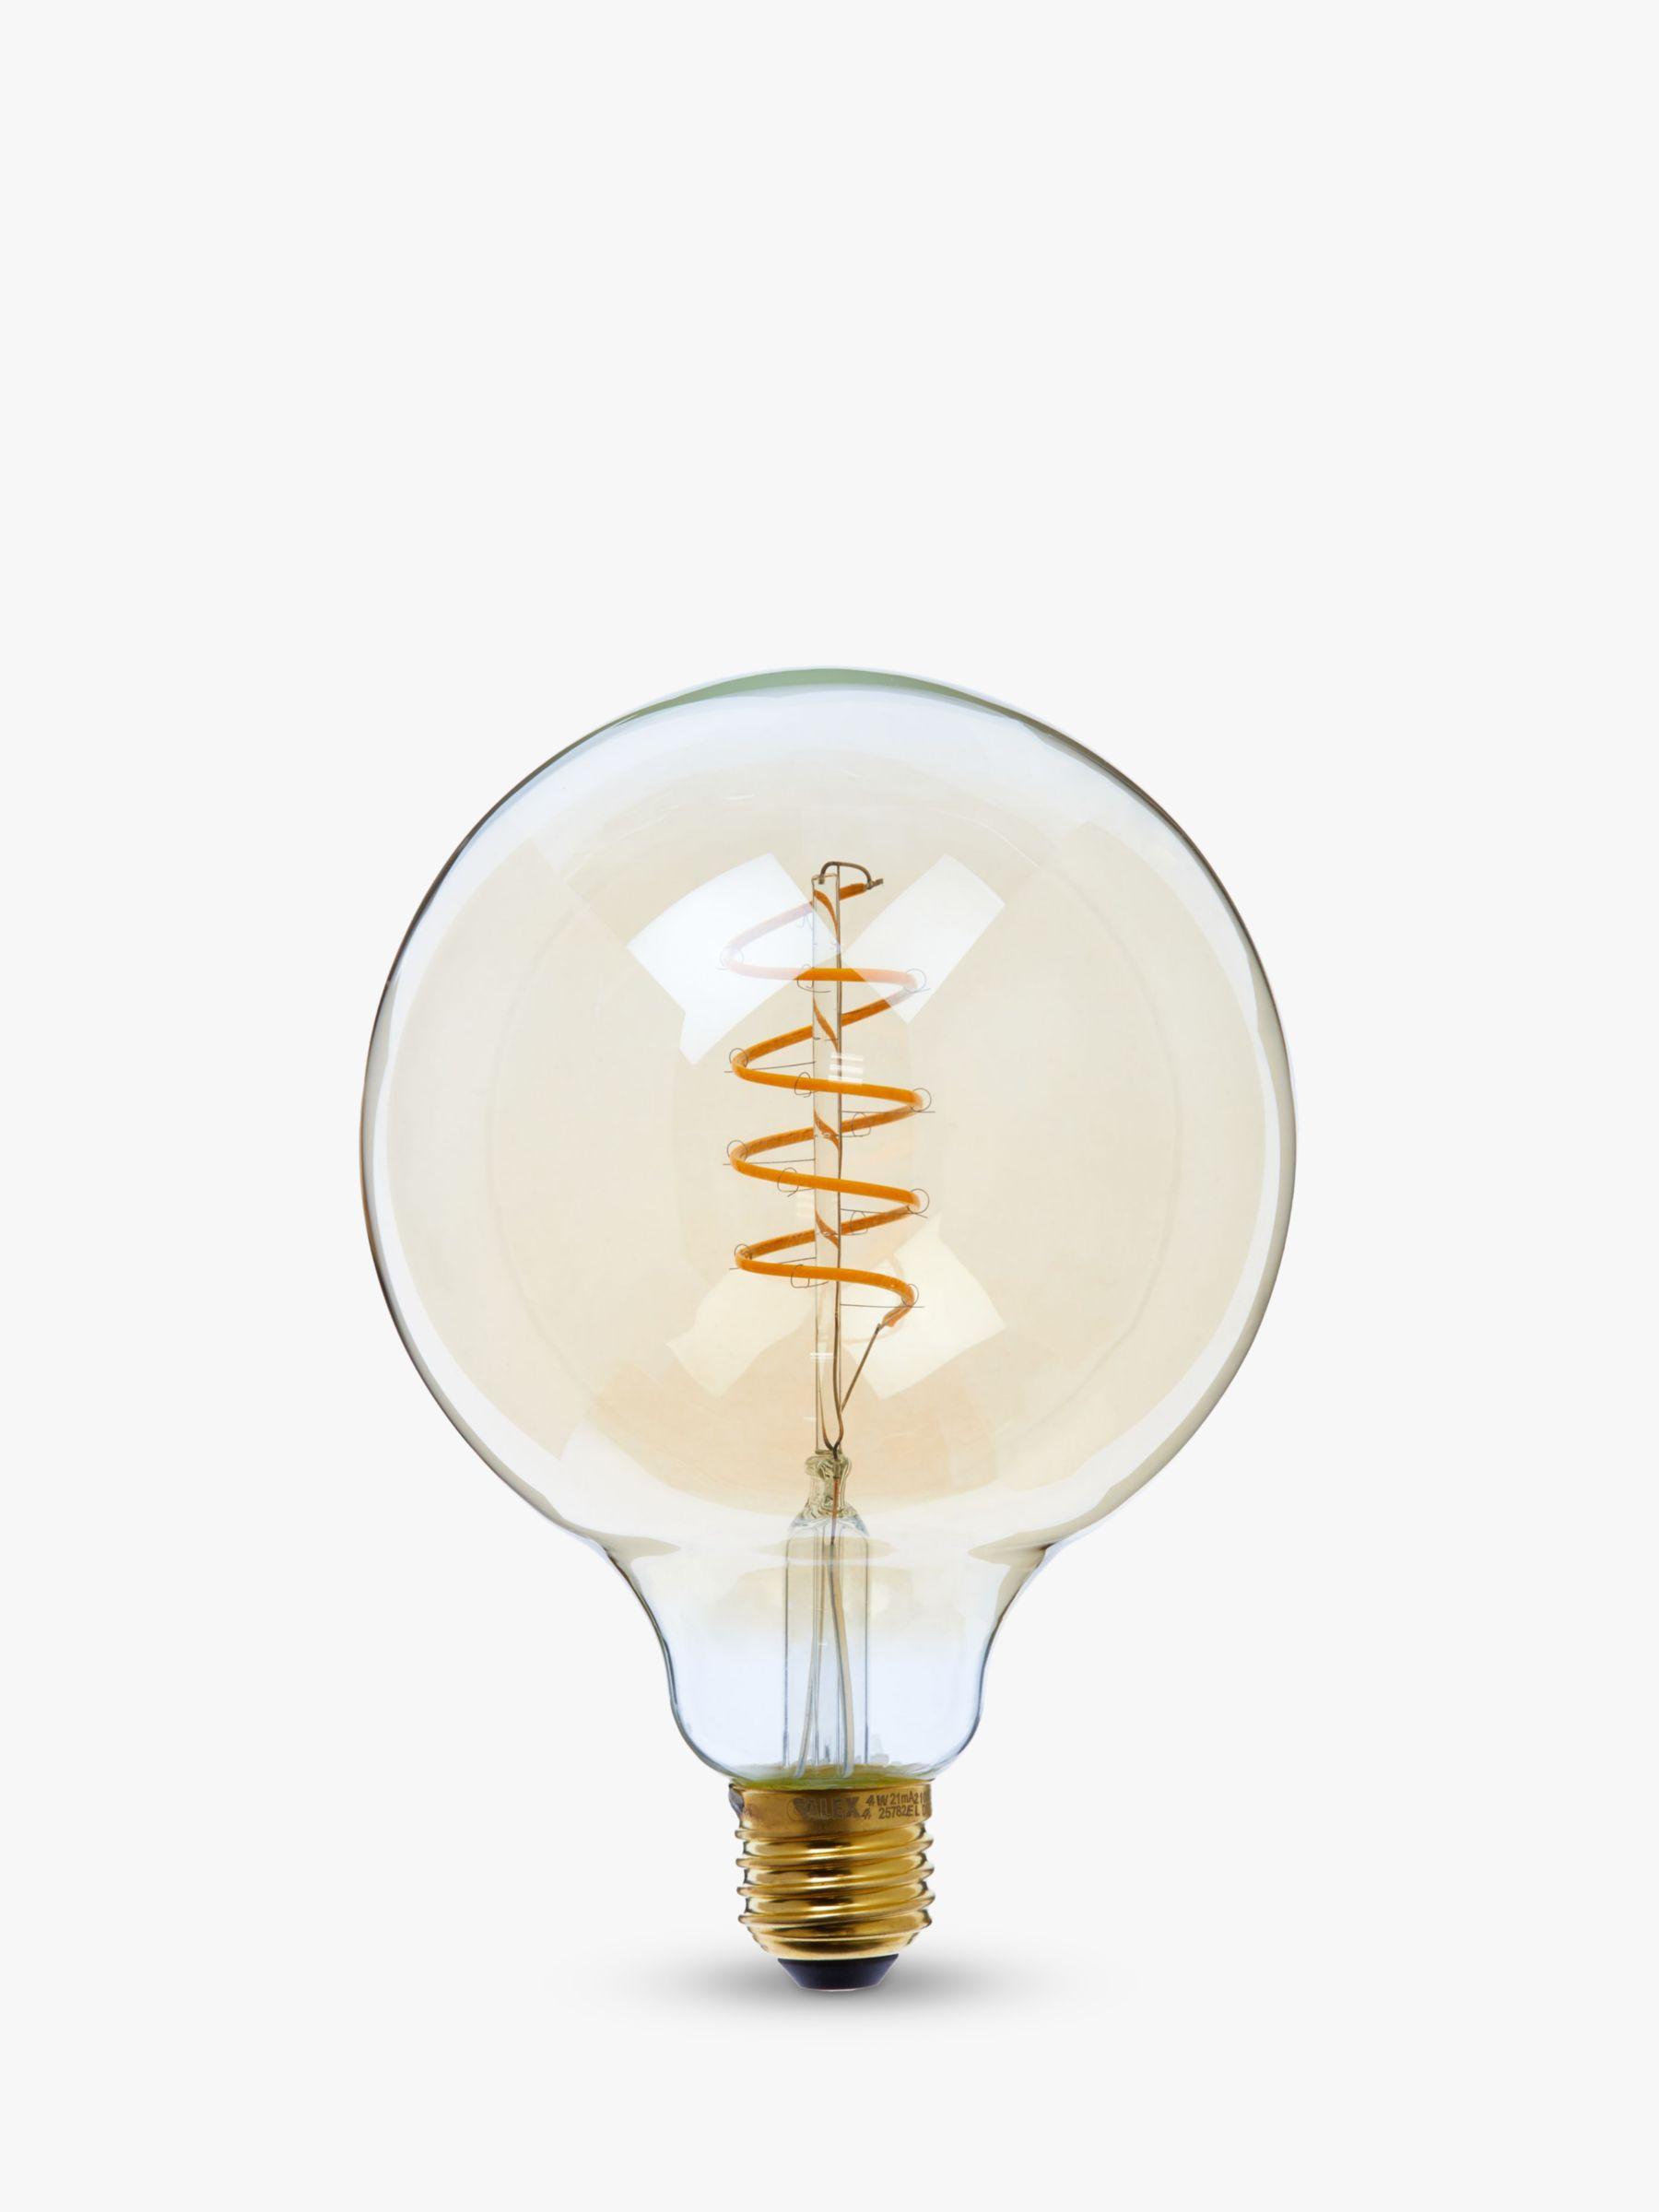 Calex Calex 4W ES LED Dimmable Flex Filament G125 Globe Bulb, Gold